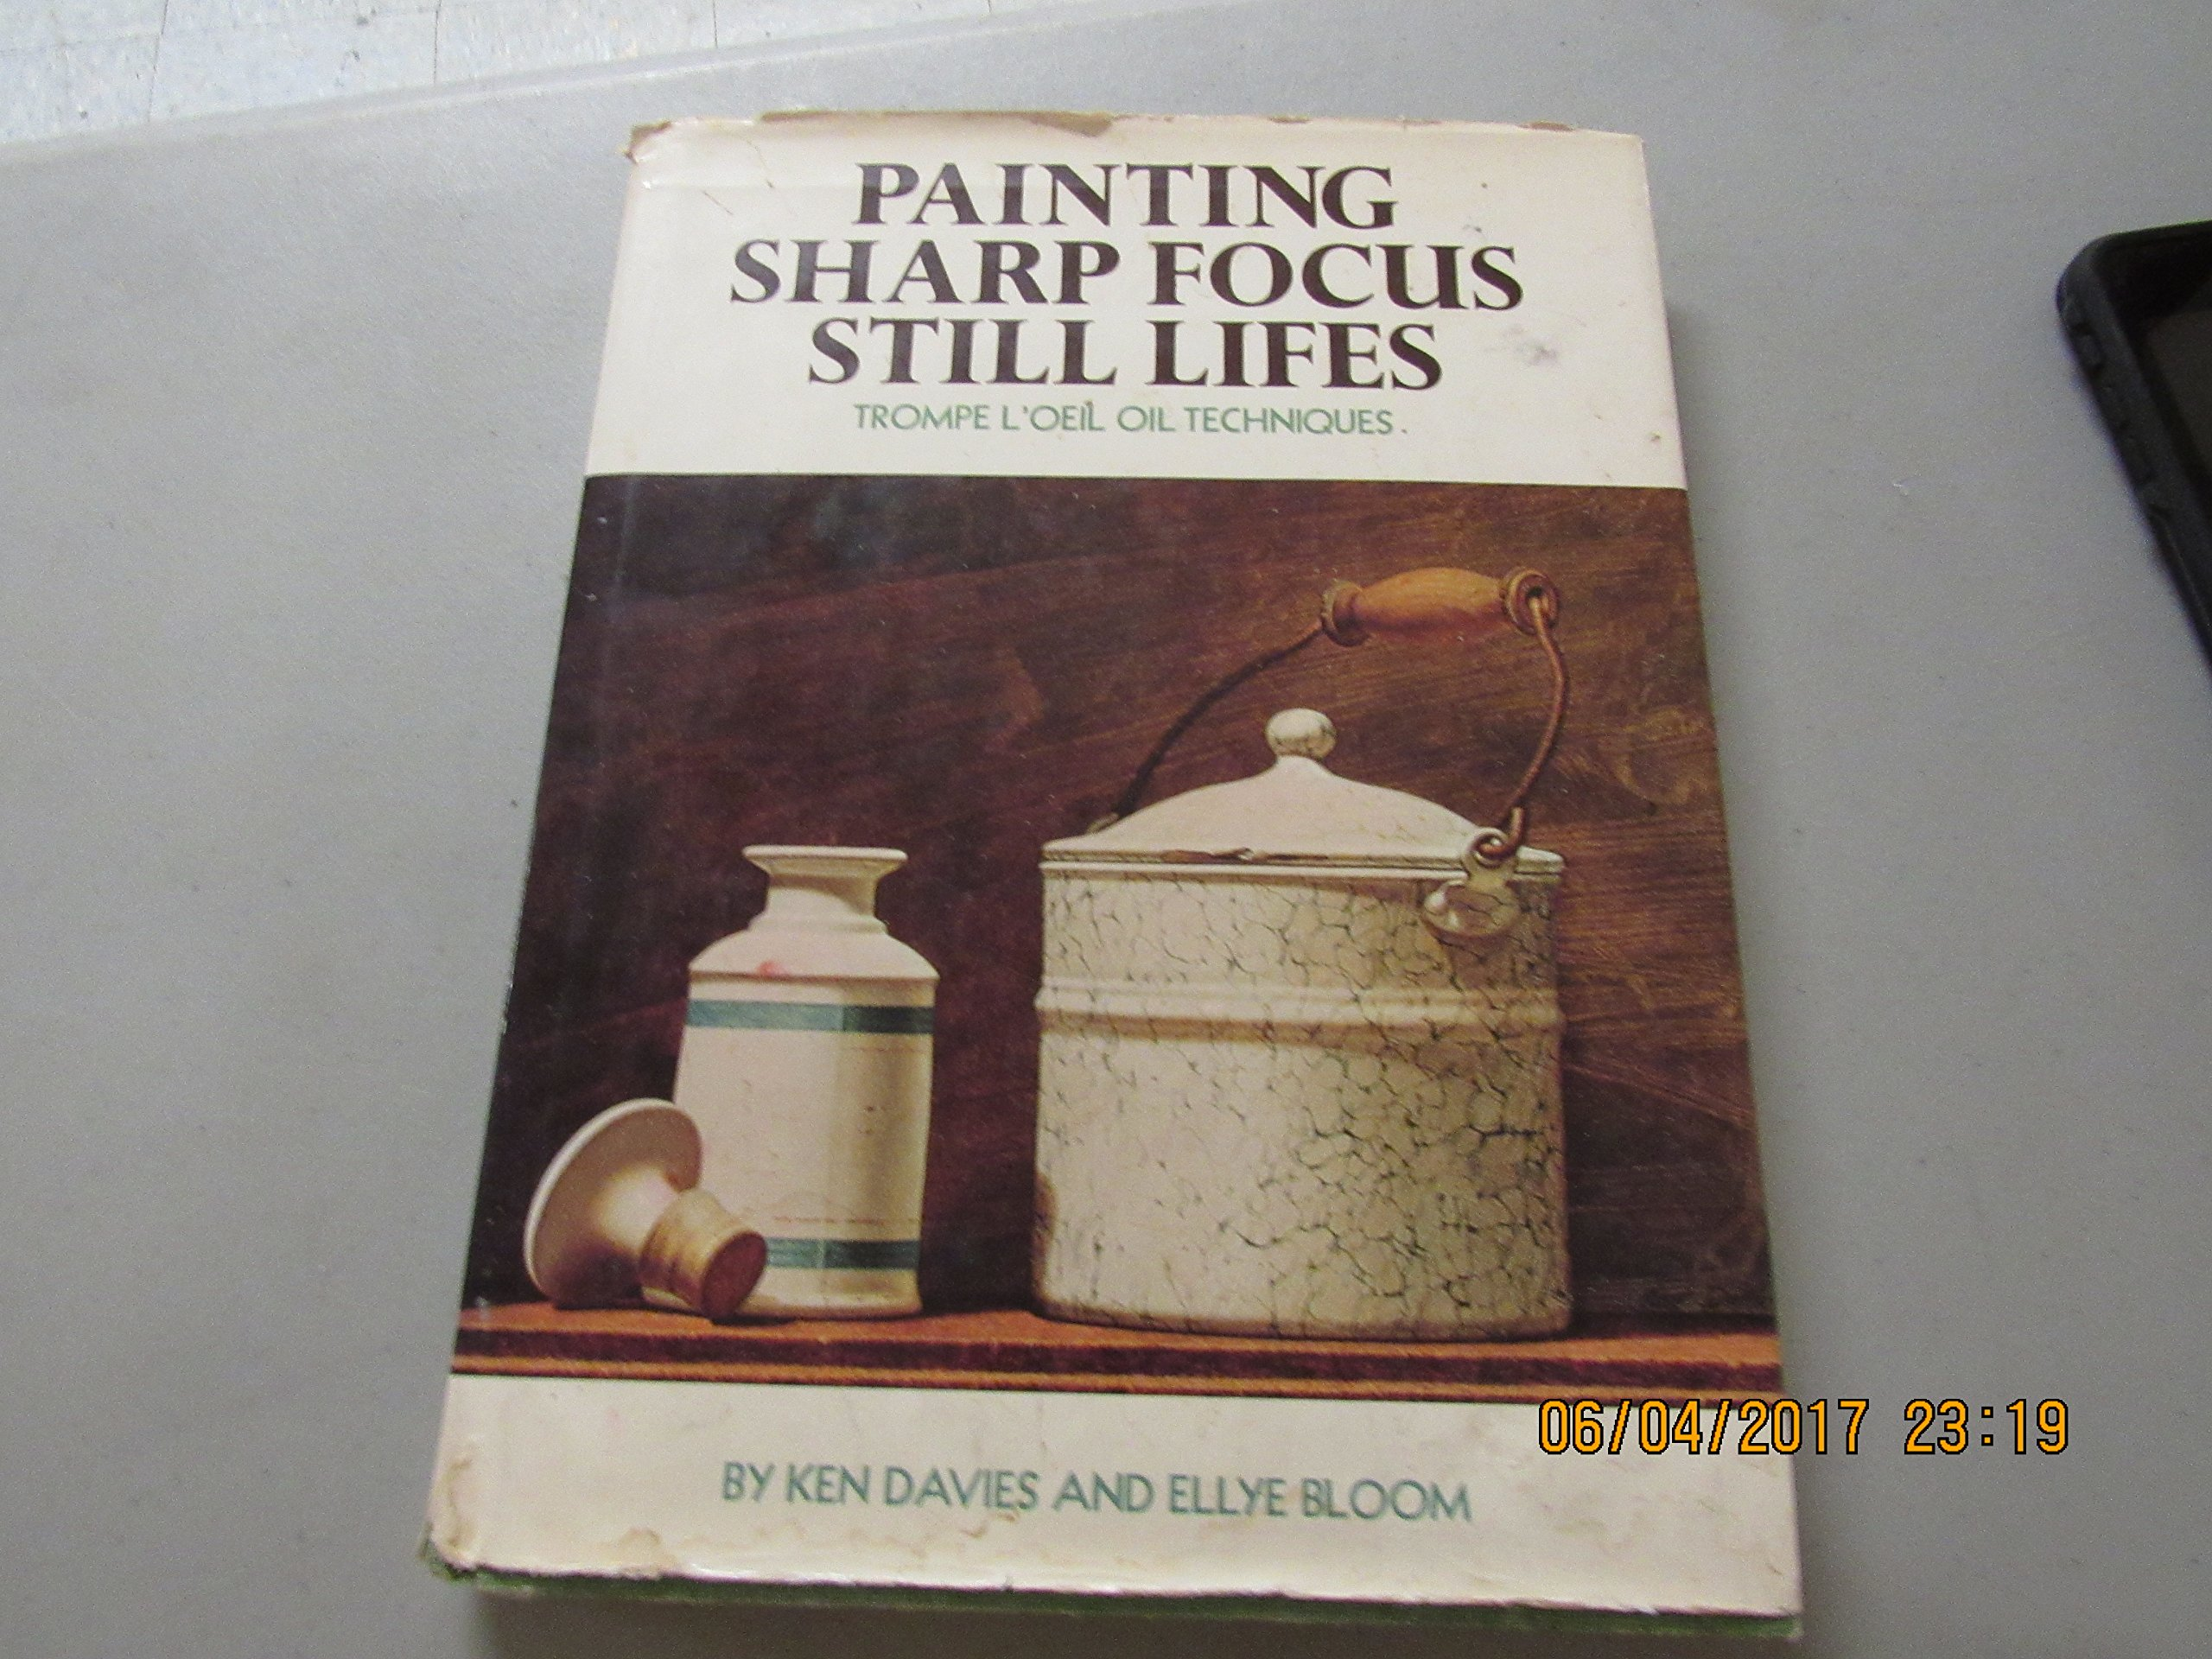 Painting Sharp Focus Still Lifes